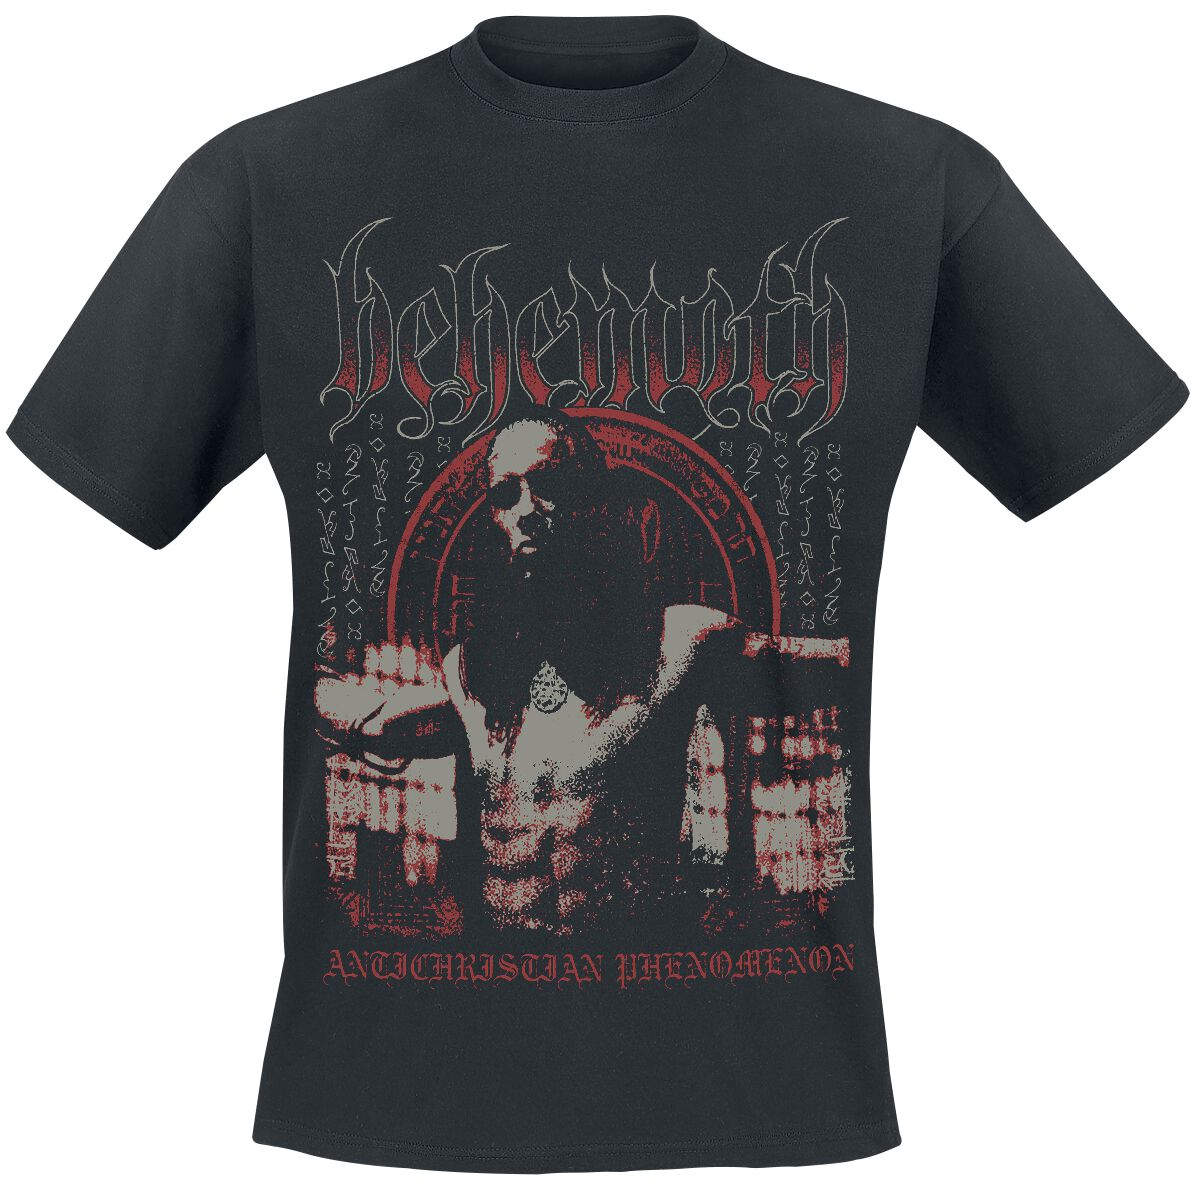 Image of Behemoth Anti-Christian T-Shirt schwarz